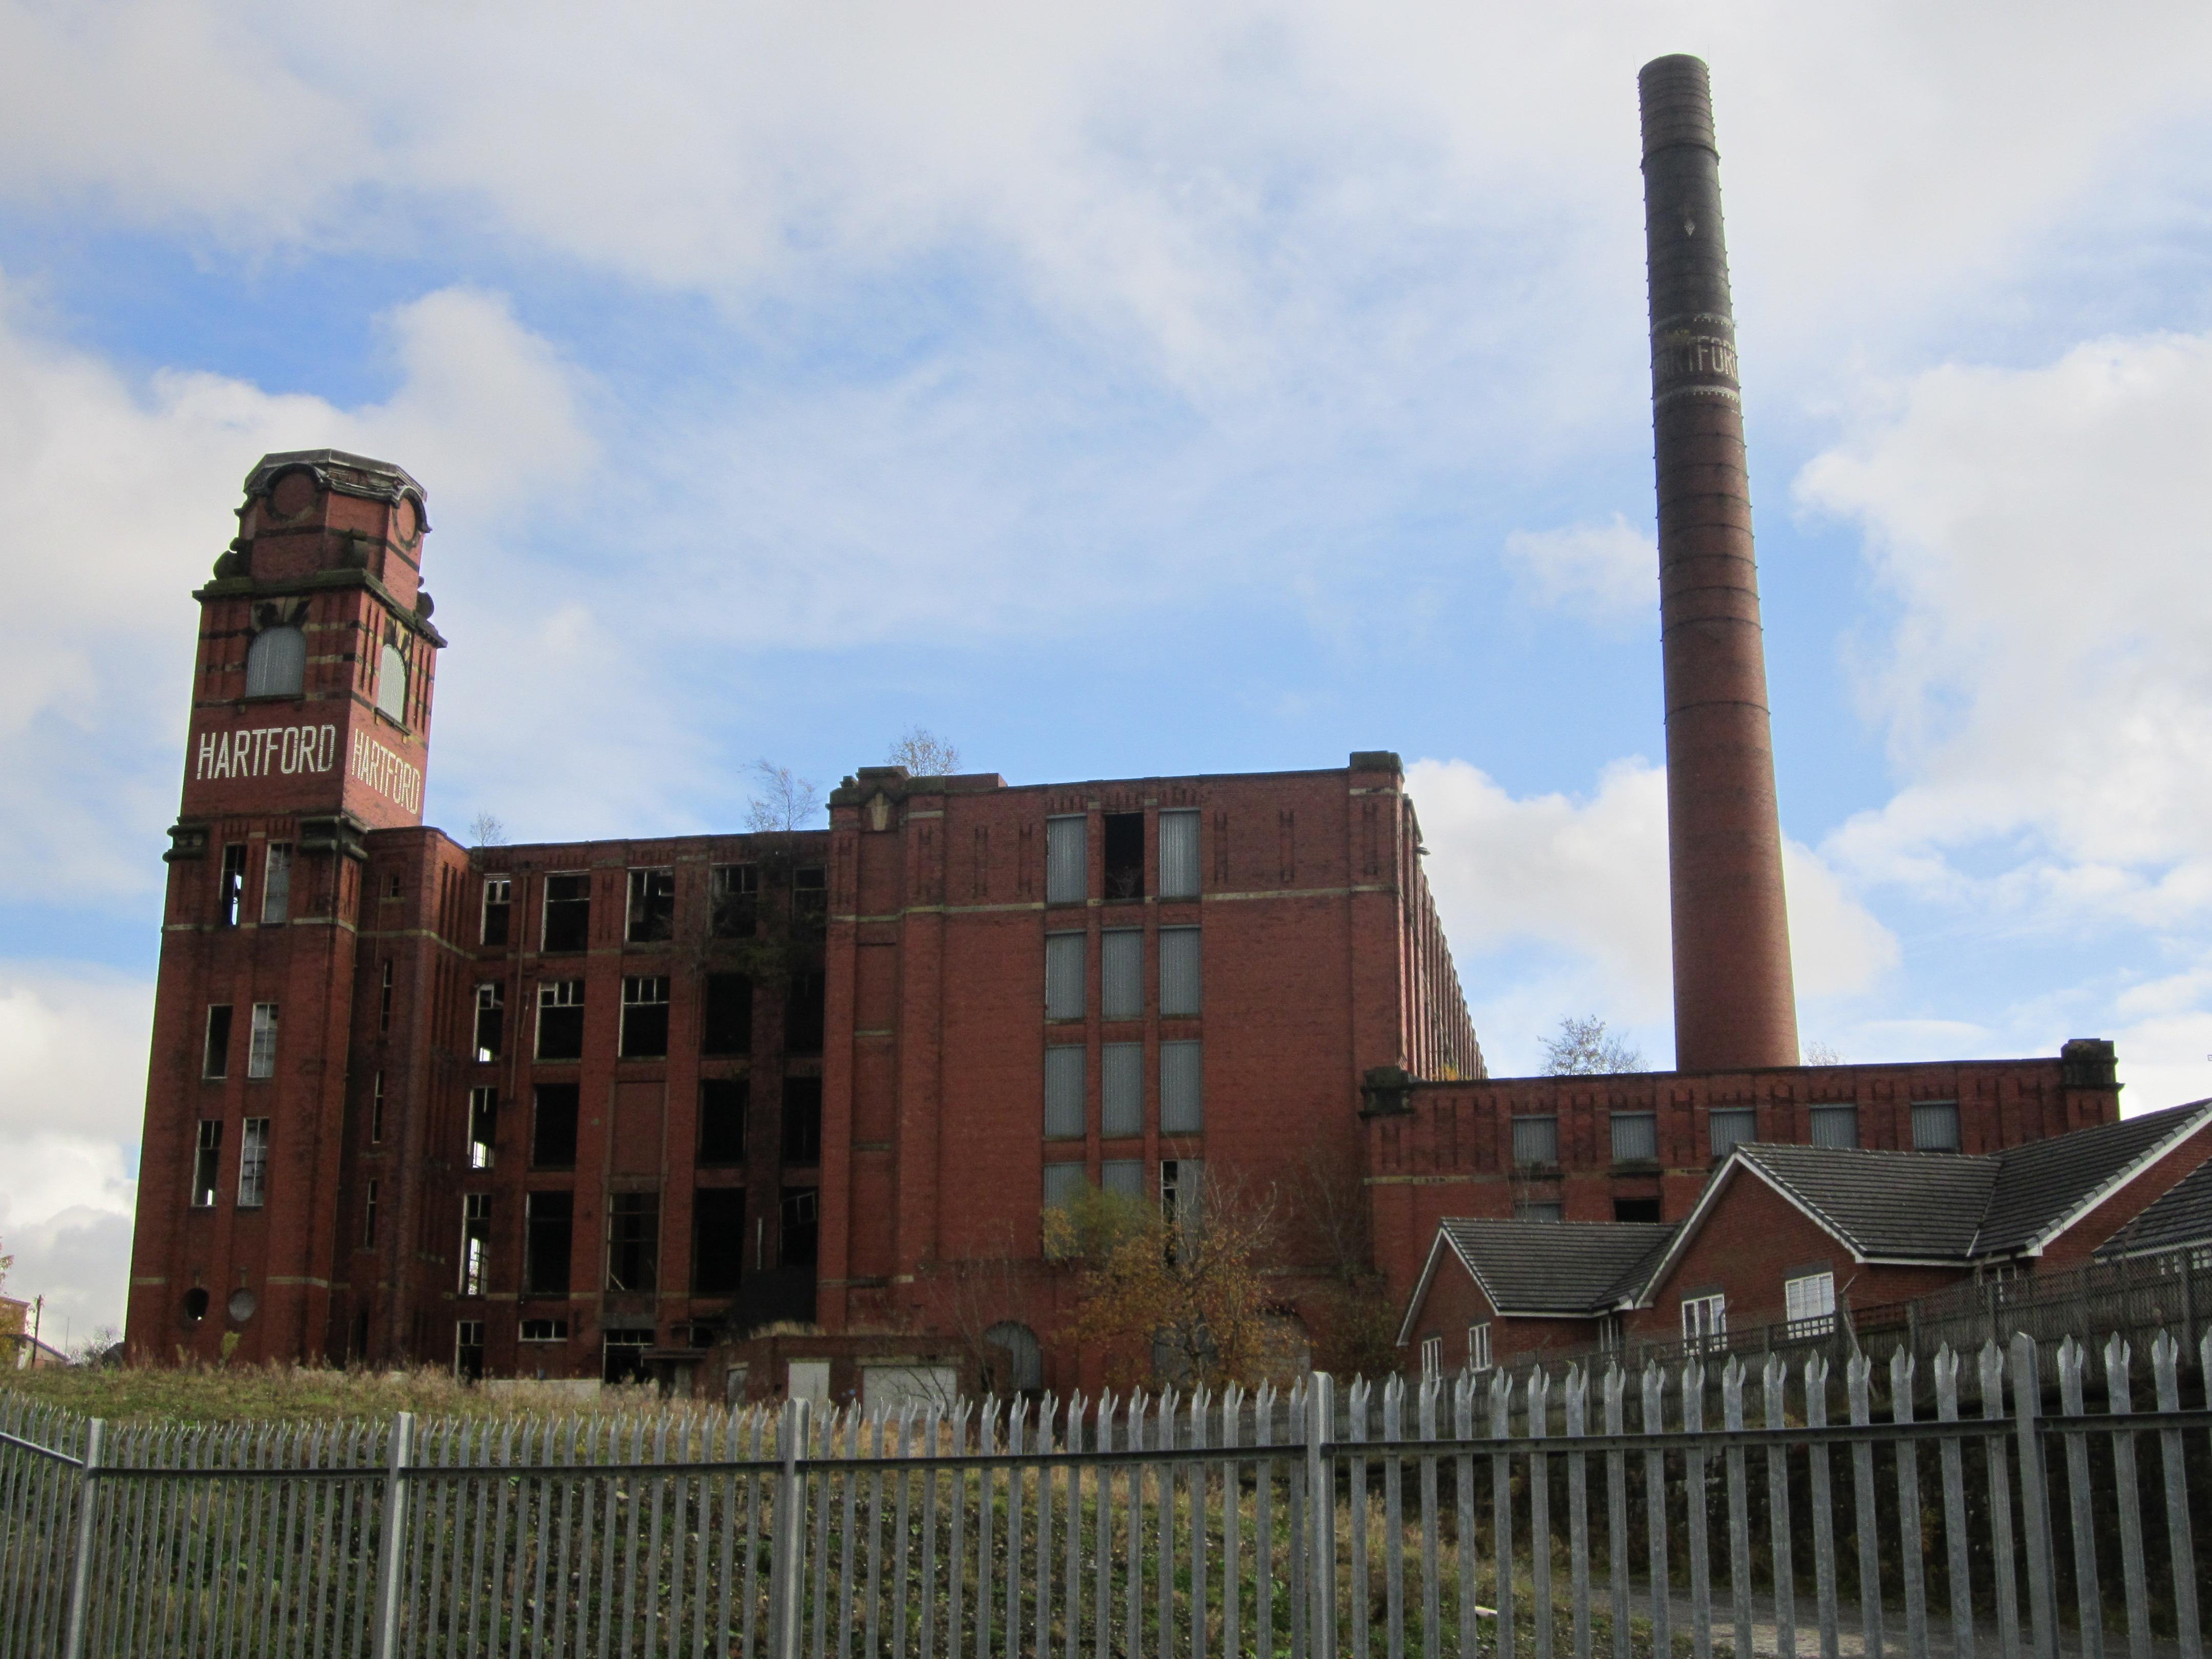 The Hartford At Work >> File:Hartford Mill, Oldham (2).JPG - Wikimedia Commons